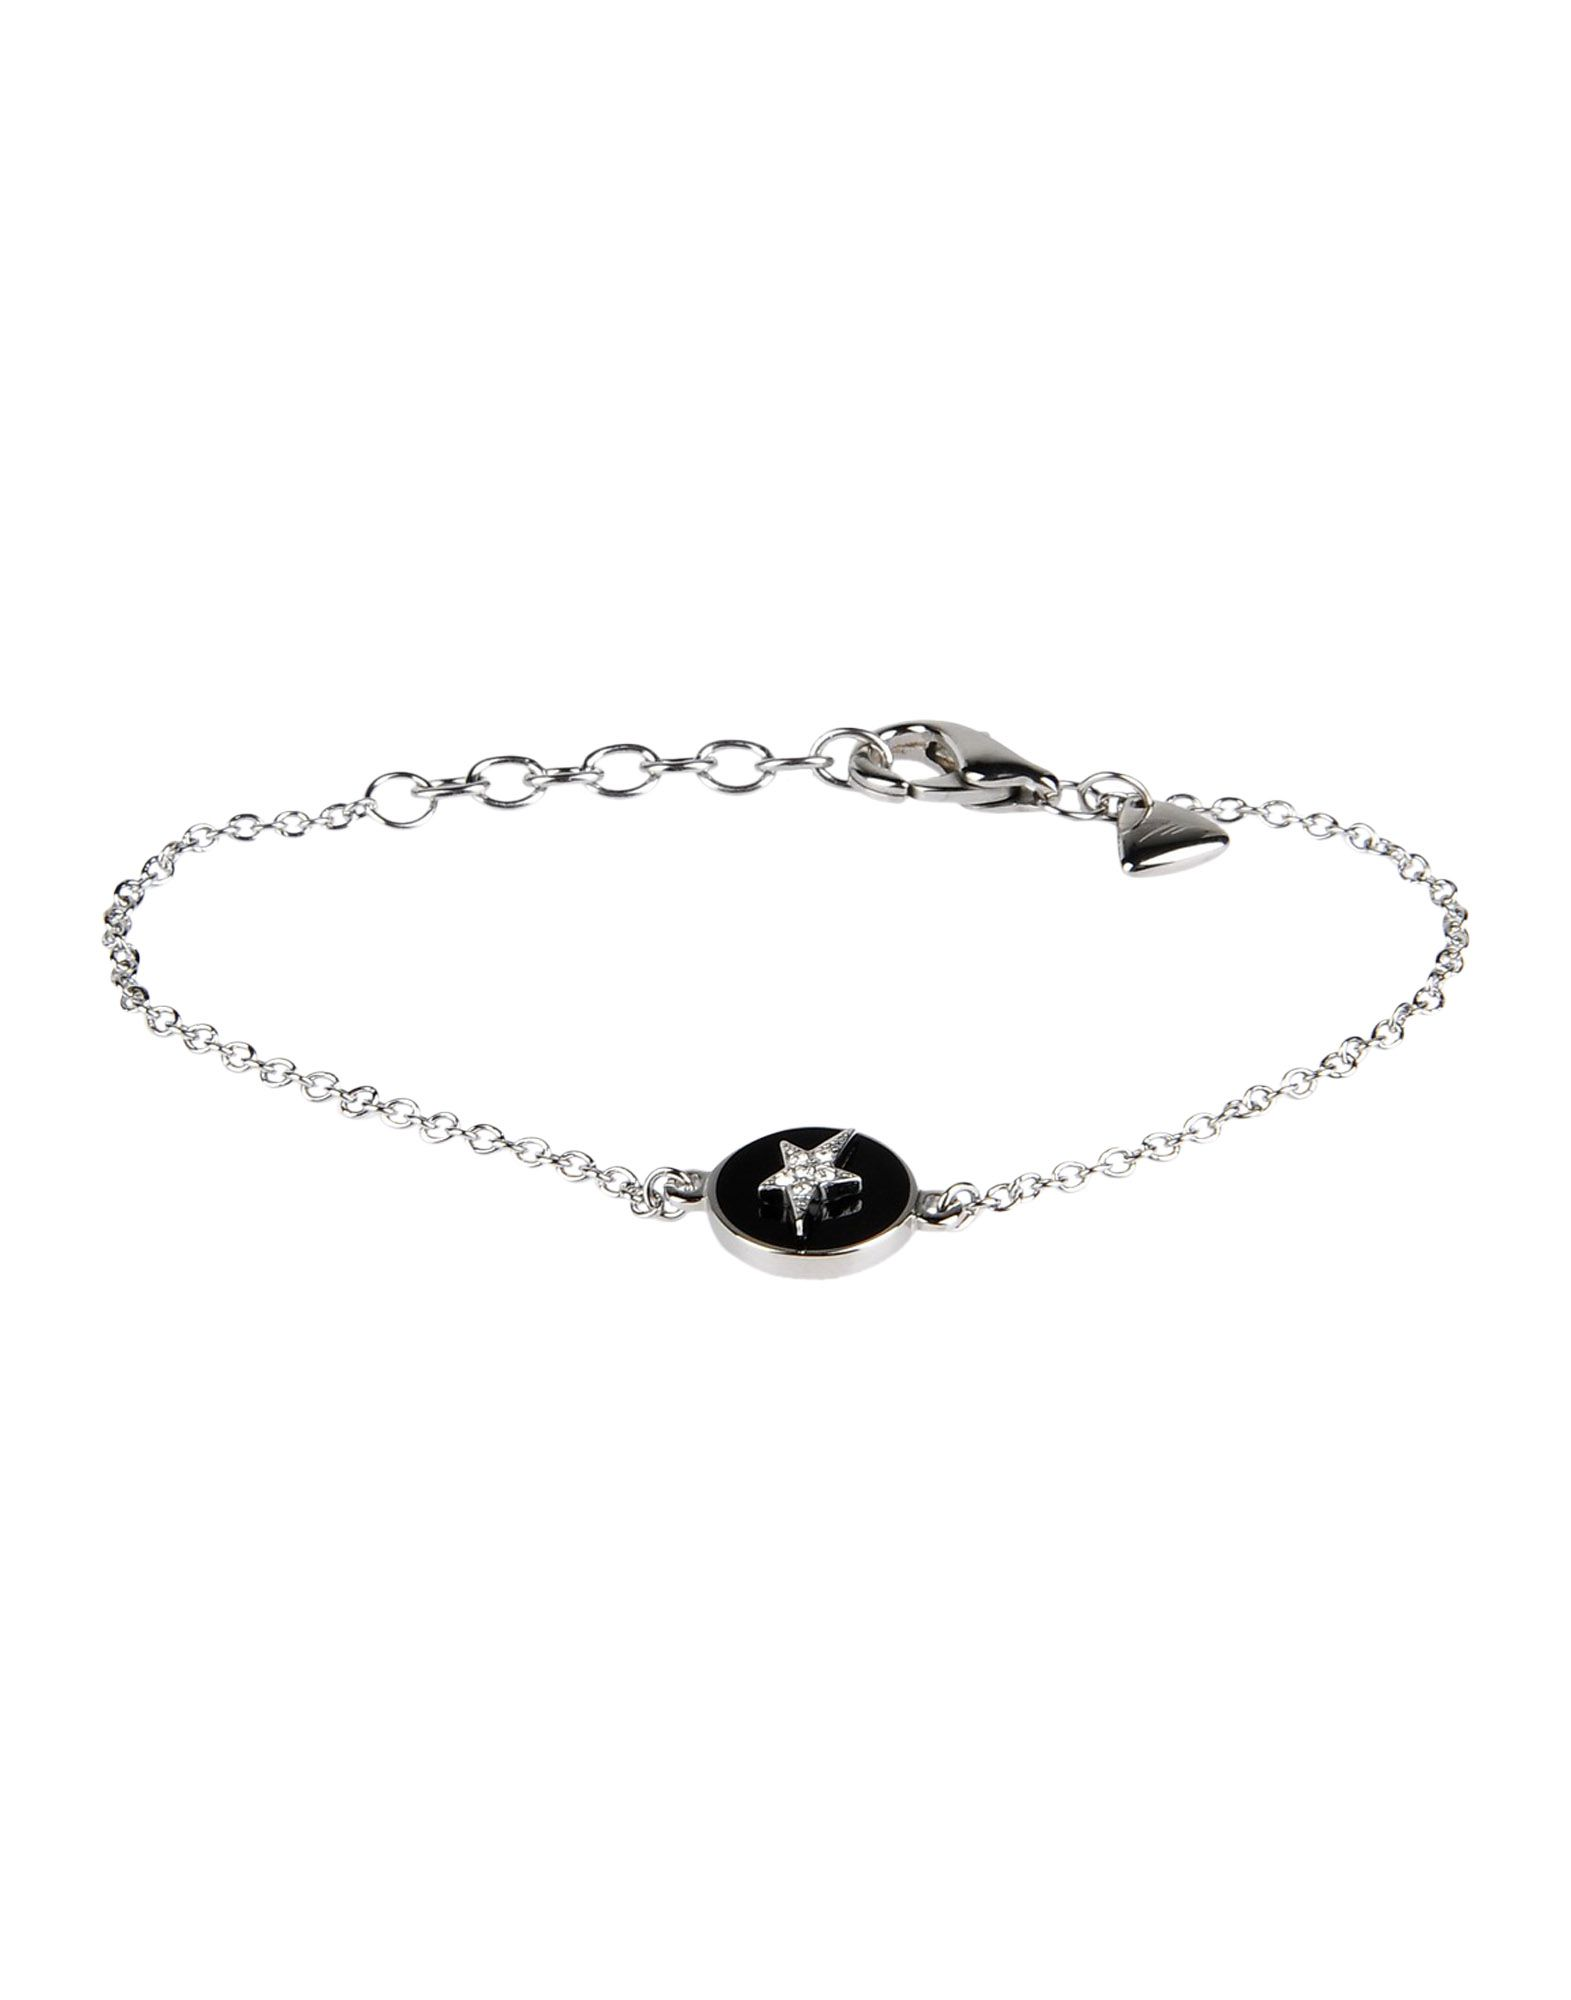 Thierry Mugler Bracelets